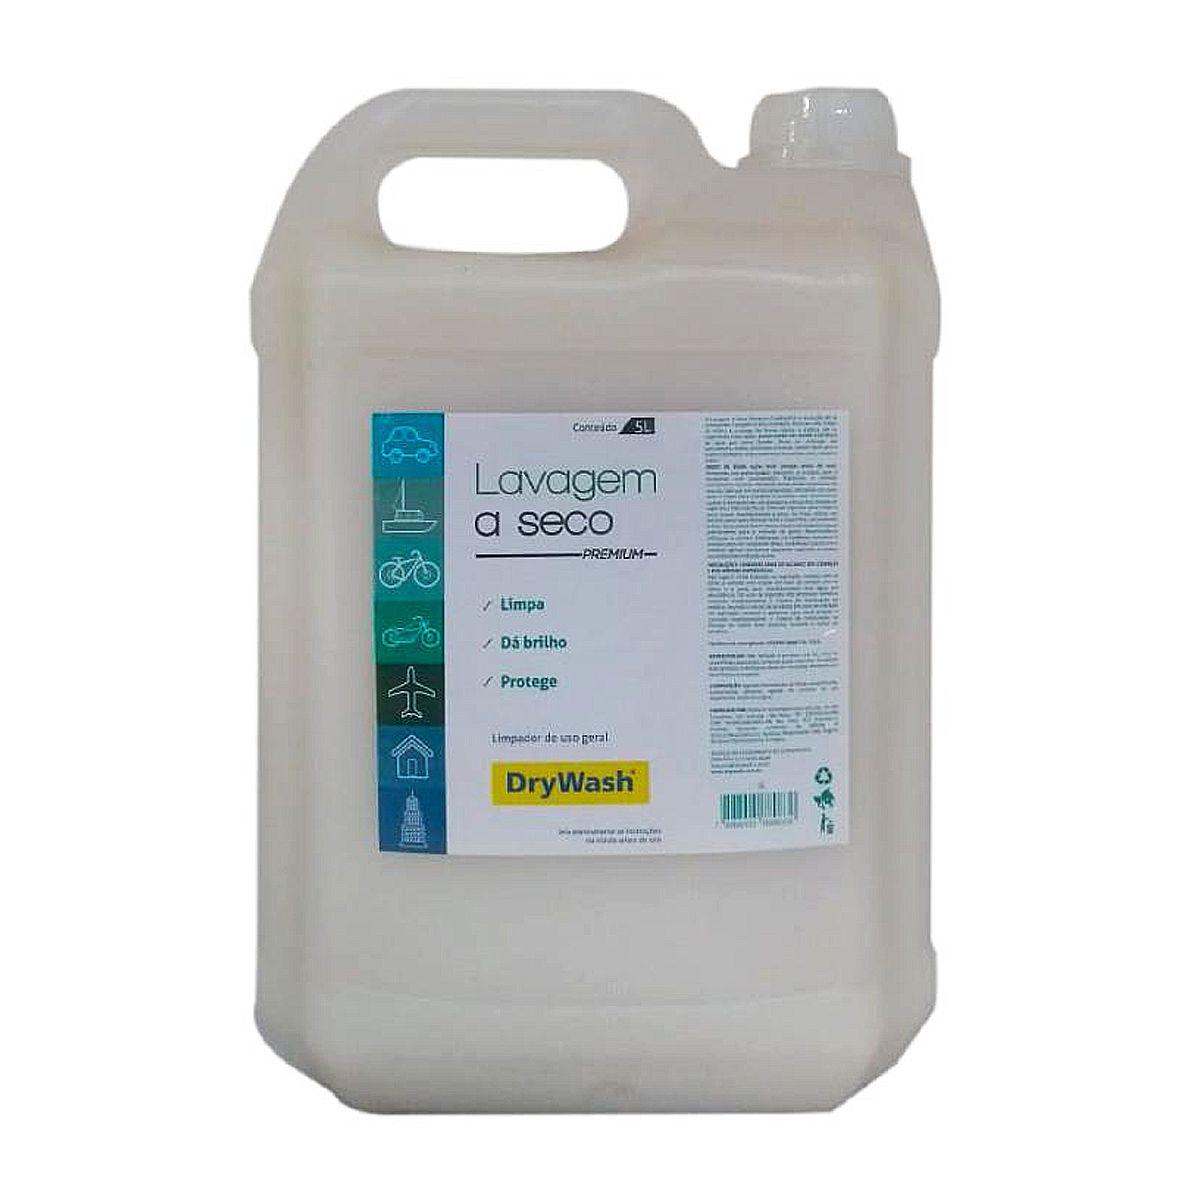 Lavagem a Seco Premium DryWash 5L